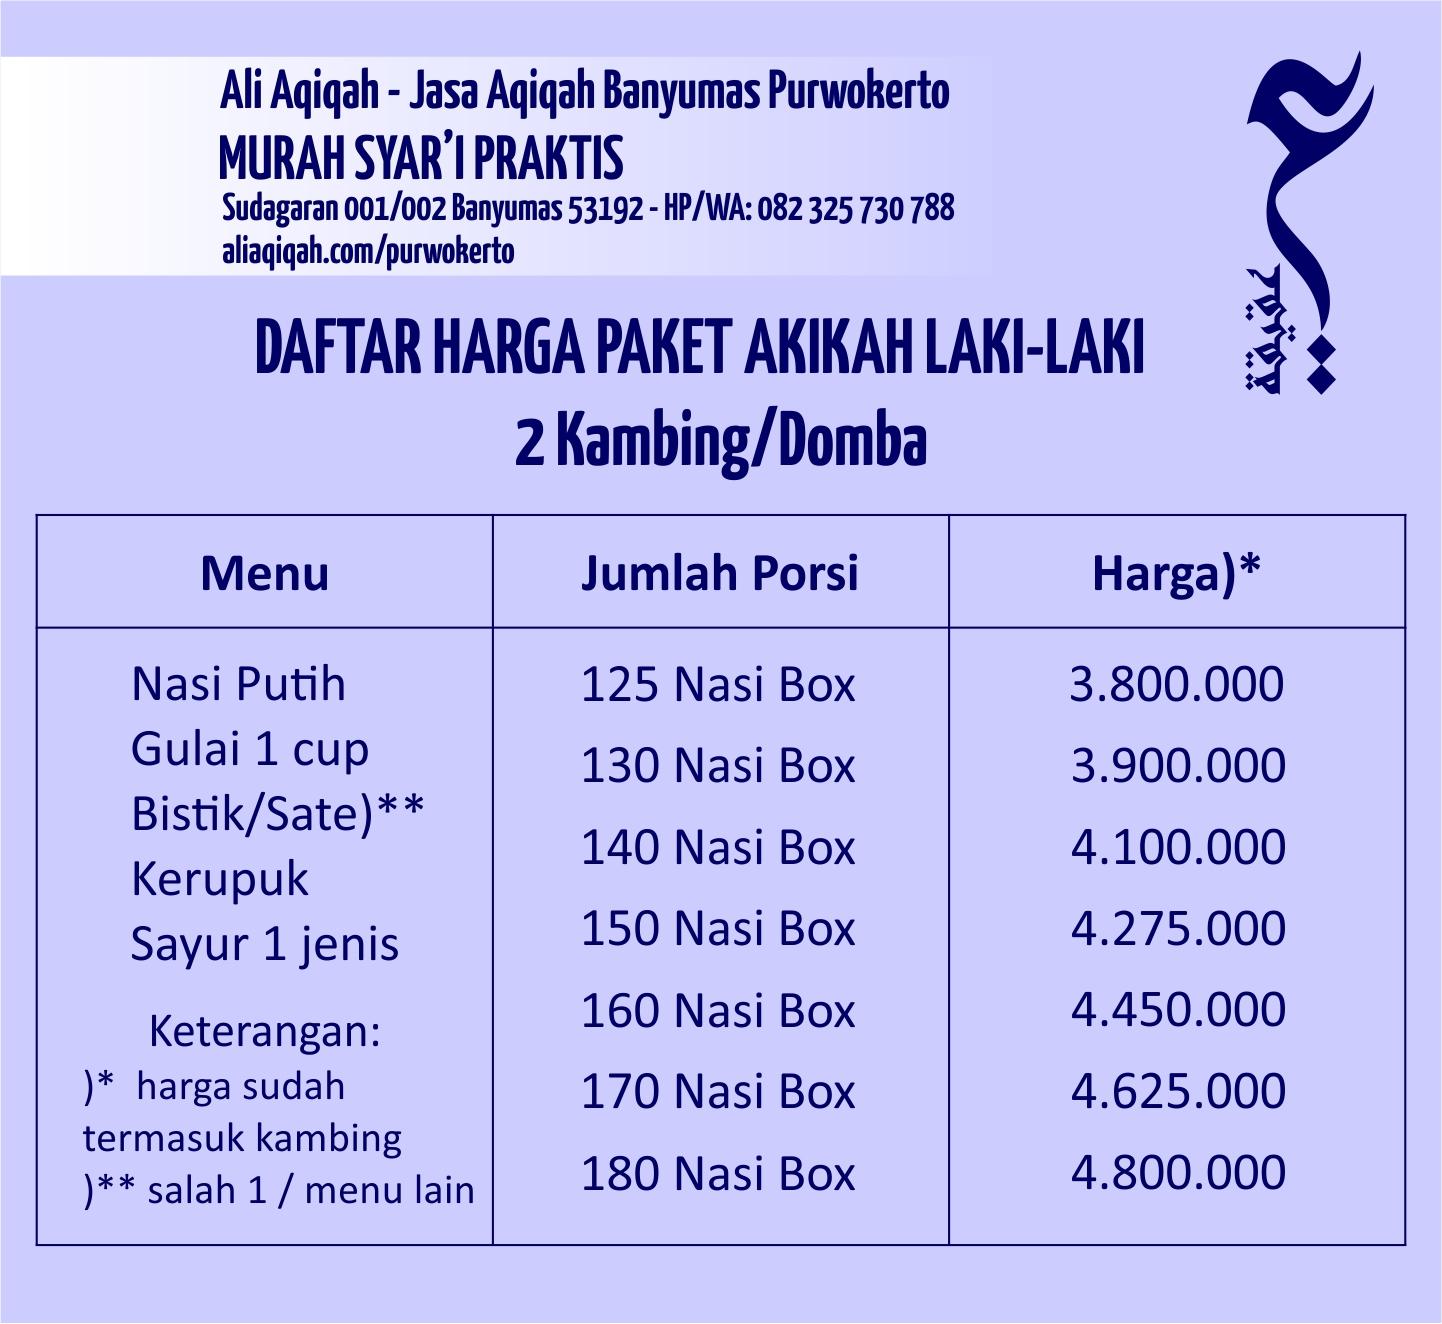 daftar harga akikah laki-laki purwokerto